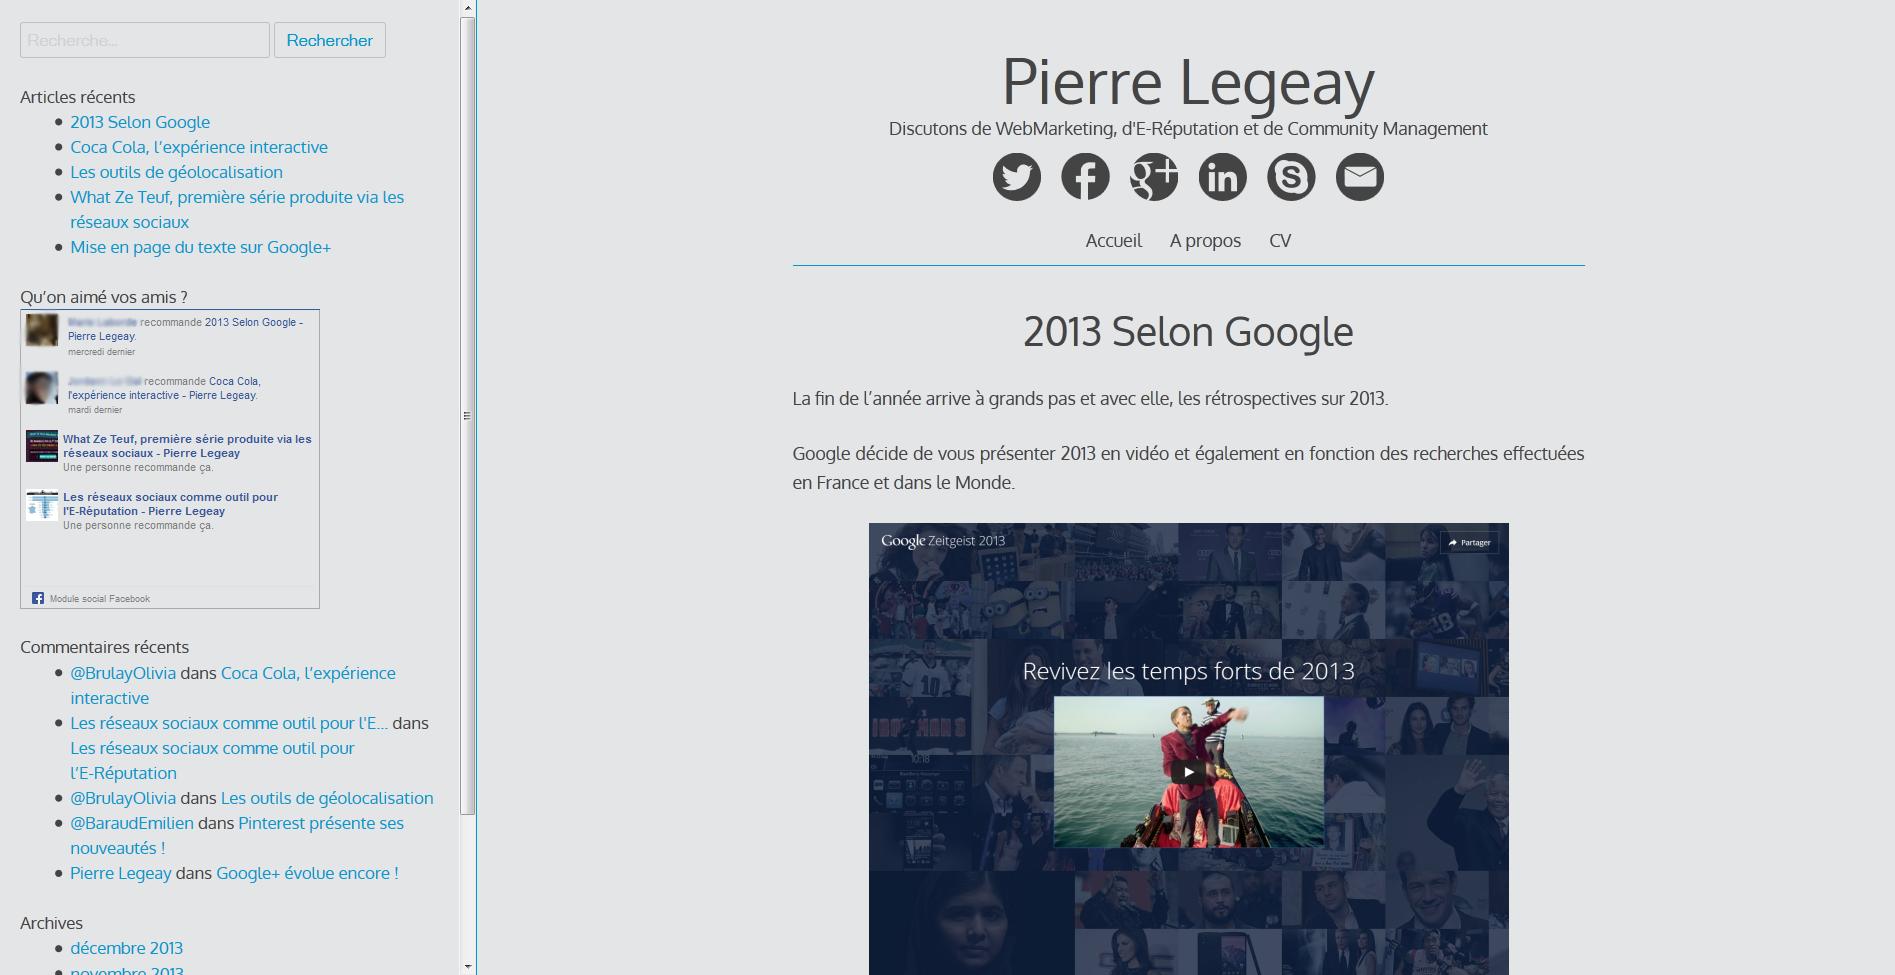 Activity Feed - Pierre Legeay